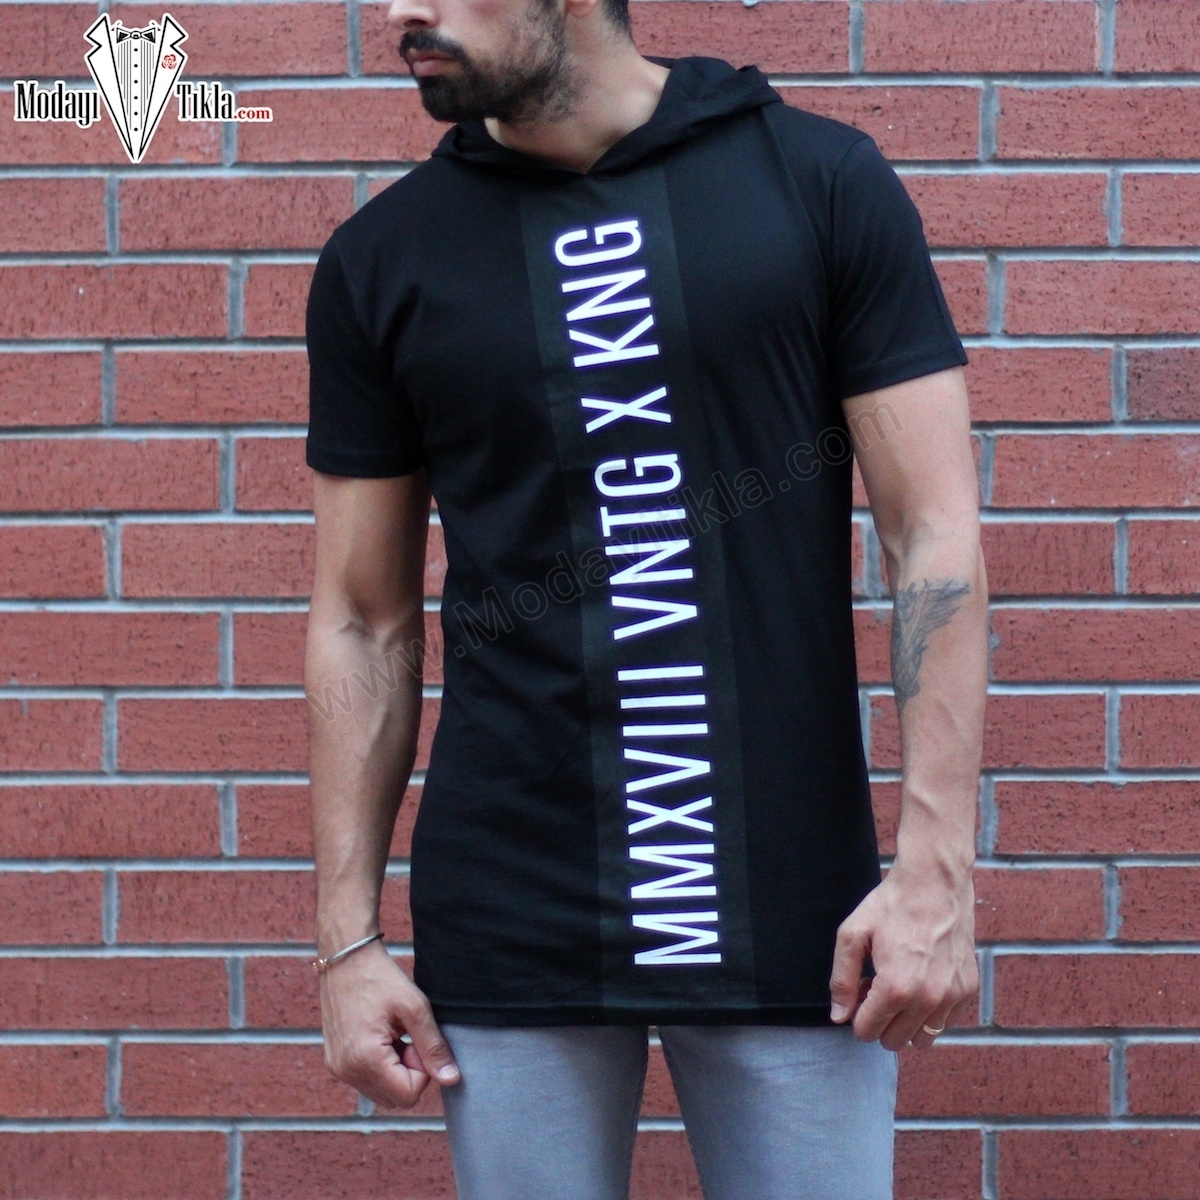 Erkek Kapüşonlu Baskılı X Siyah T-shirt